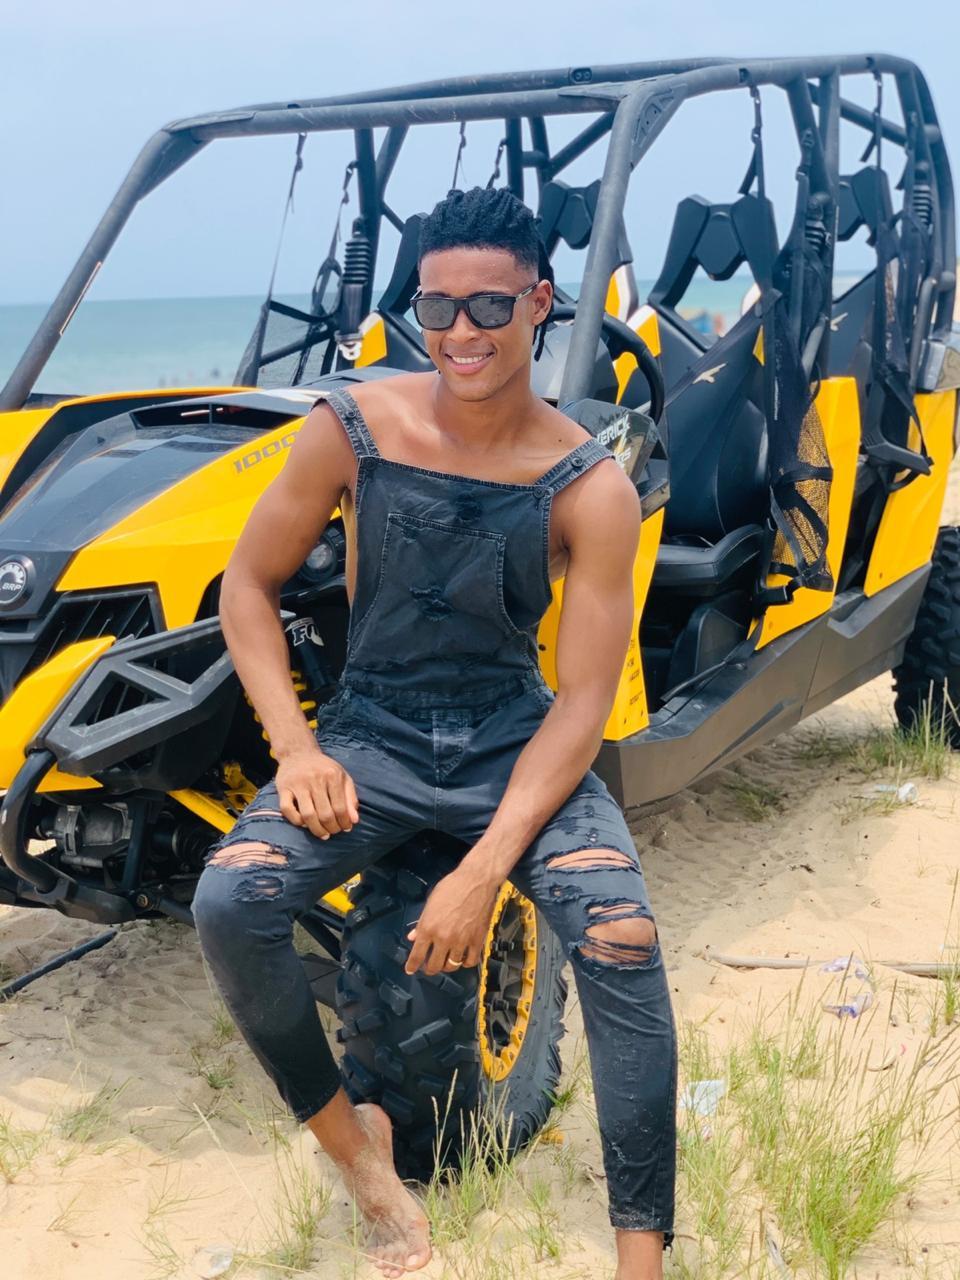 Angola já conta com o novo representante de beleza masculina